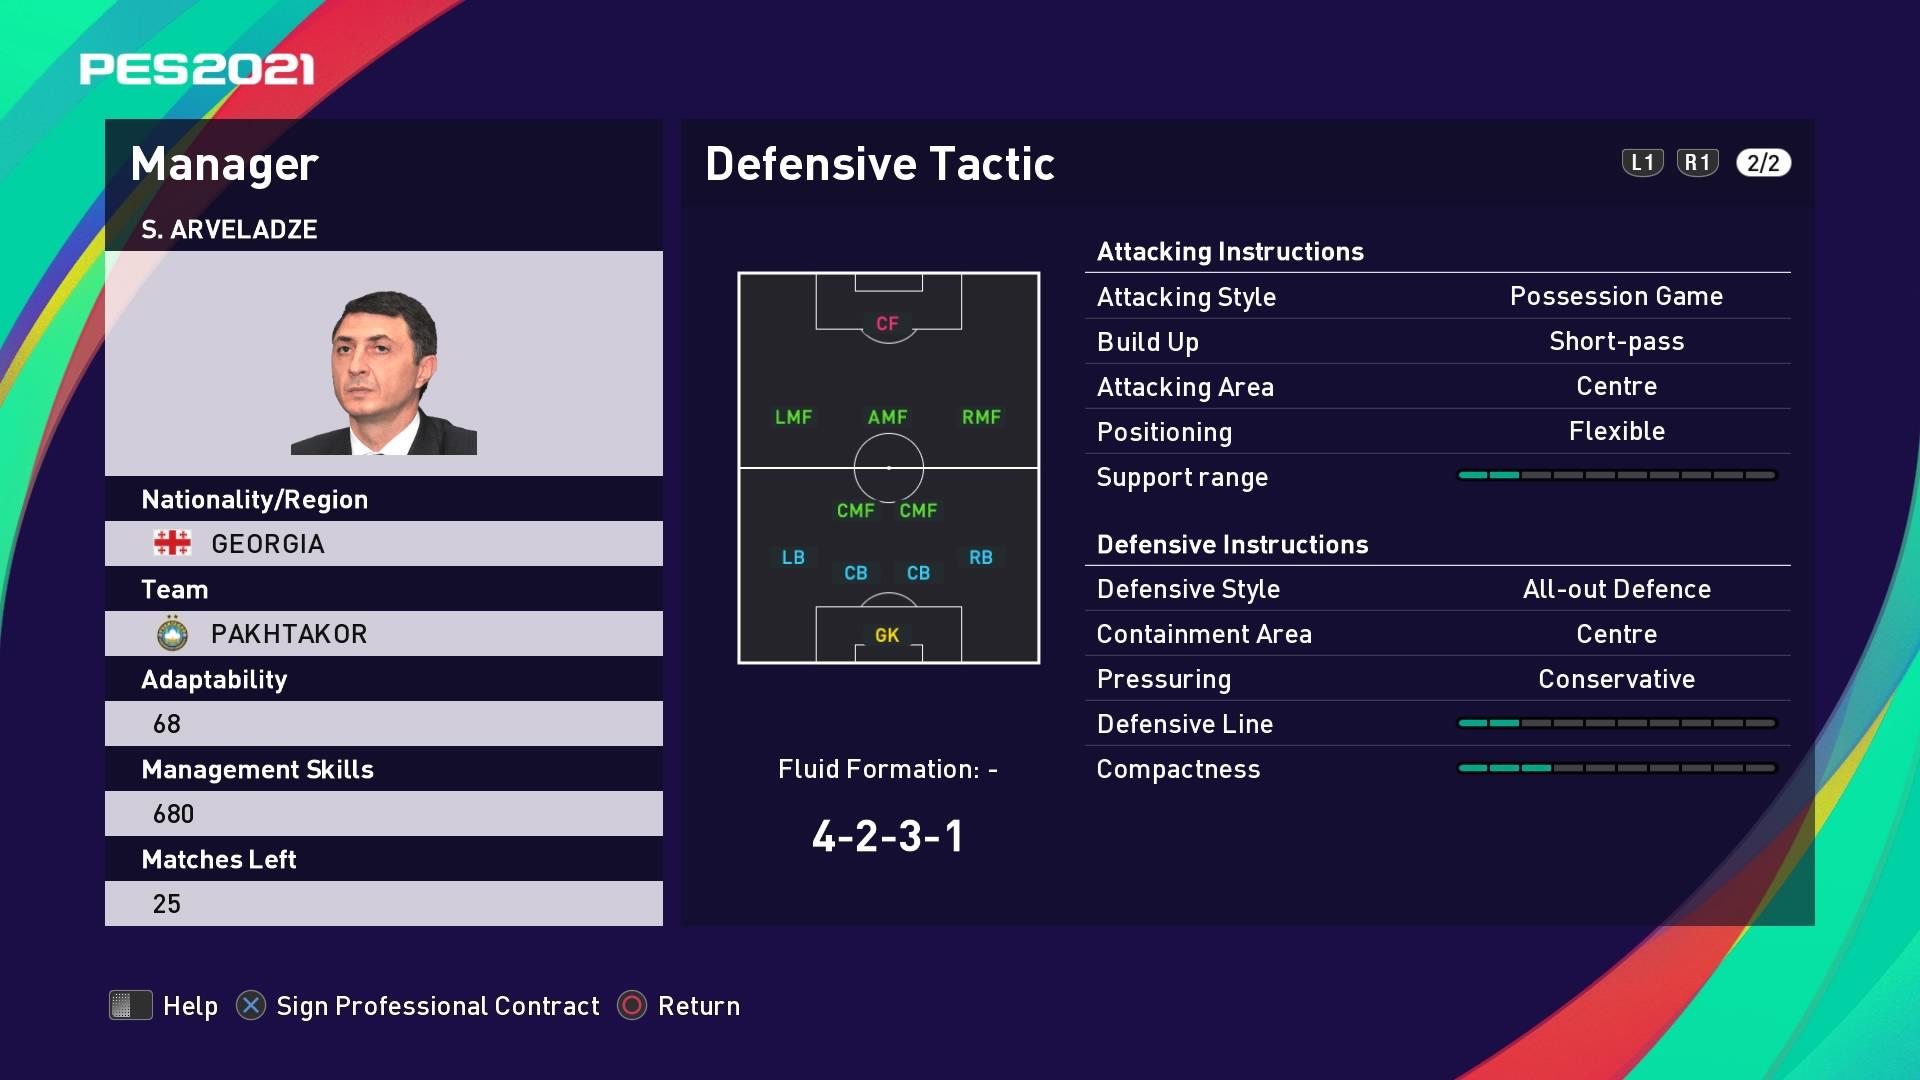 S. Arveladze (Shota Arveladze) Defensive Tactic in PES 2021 myClub